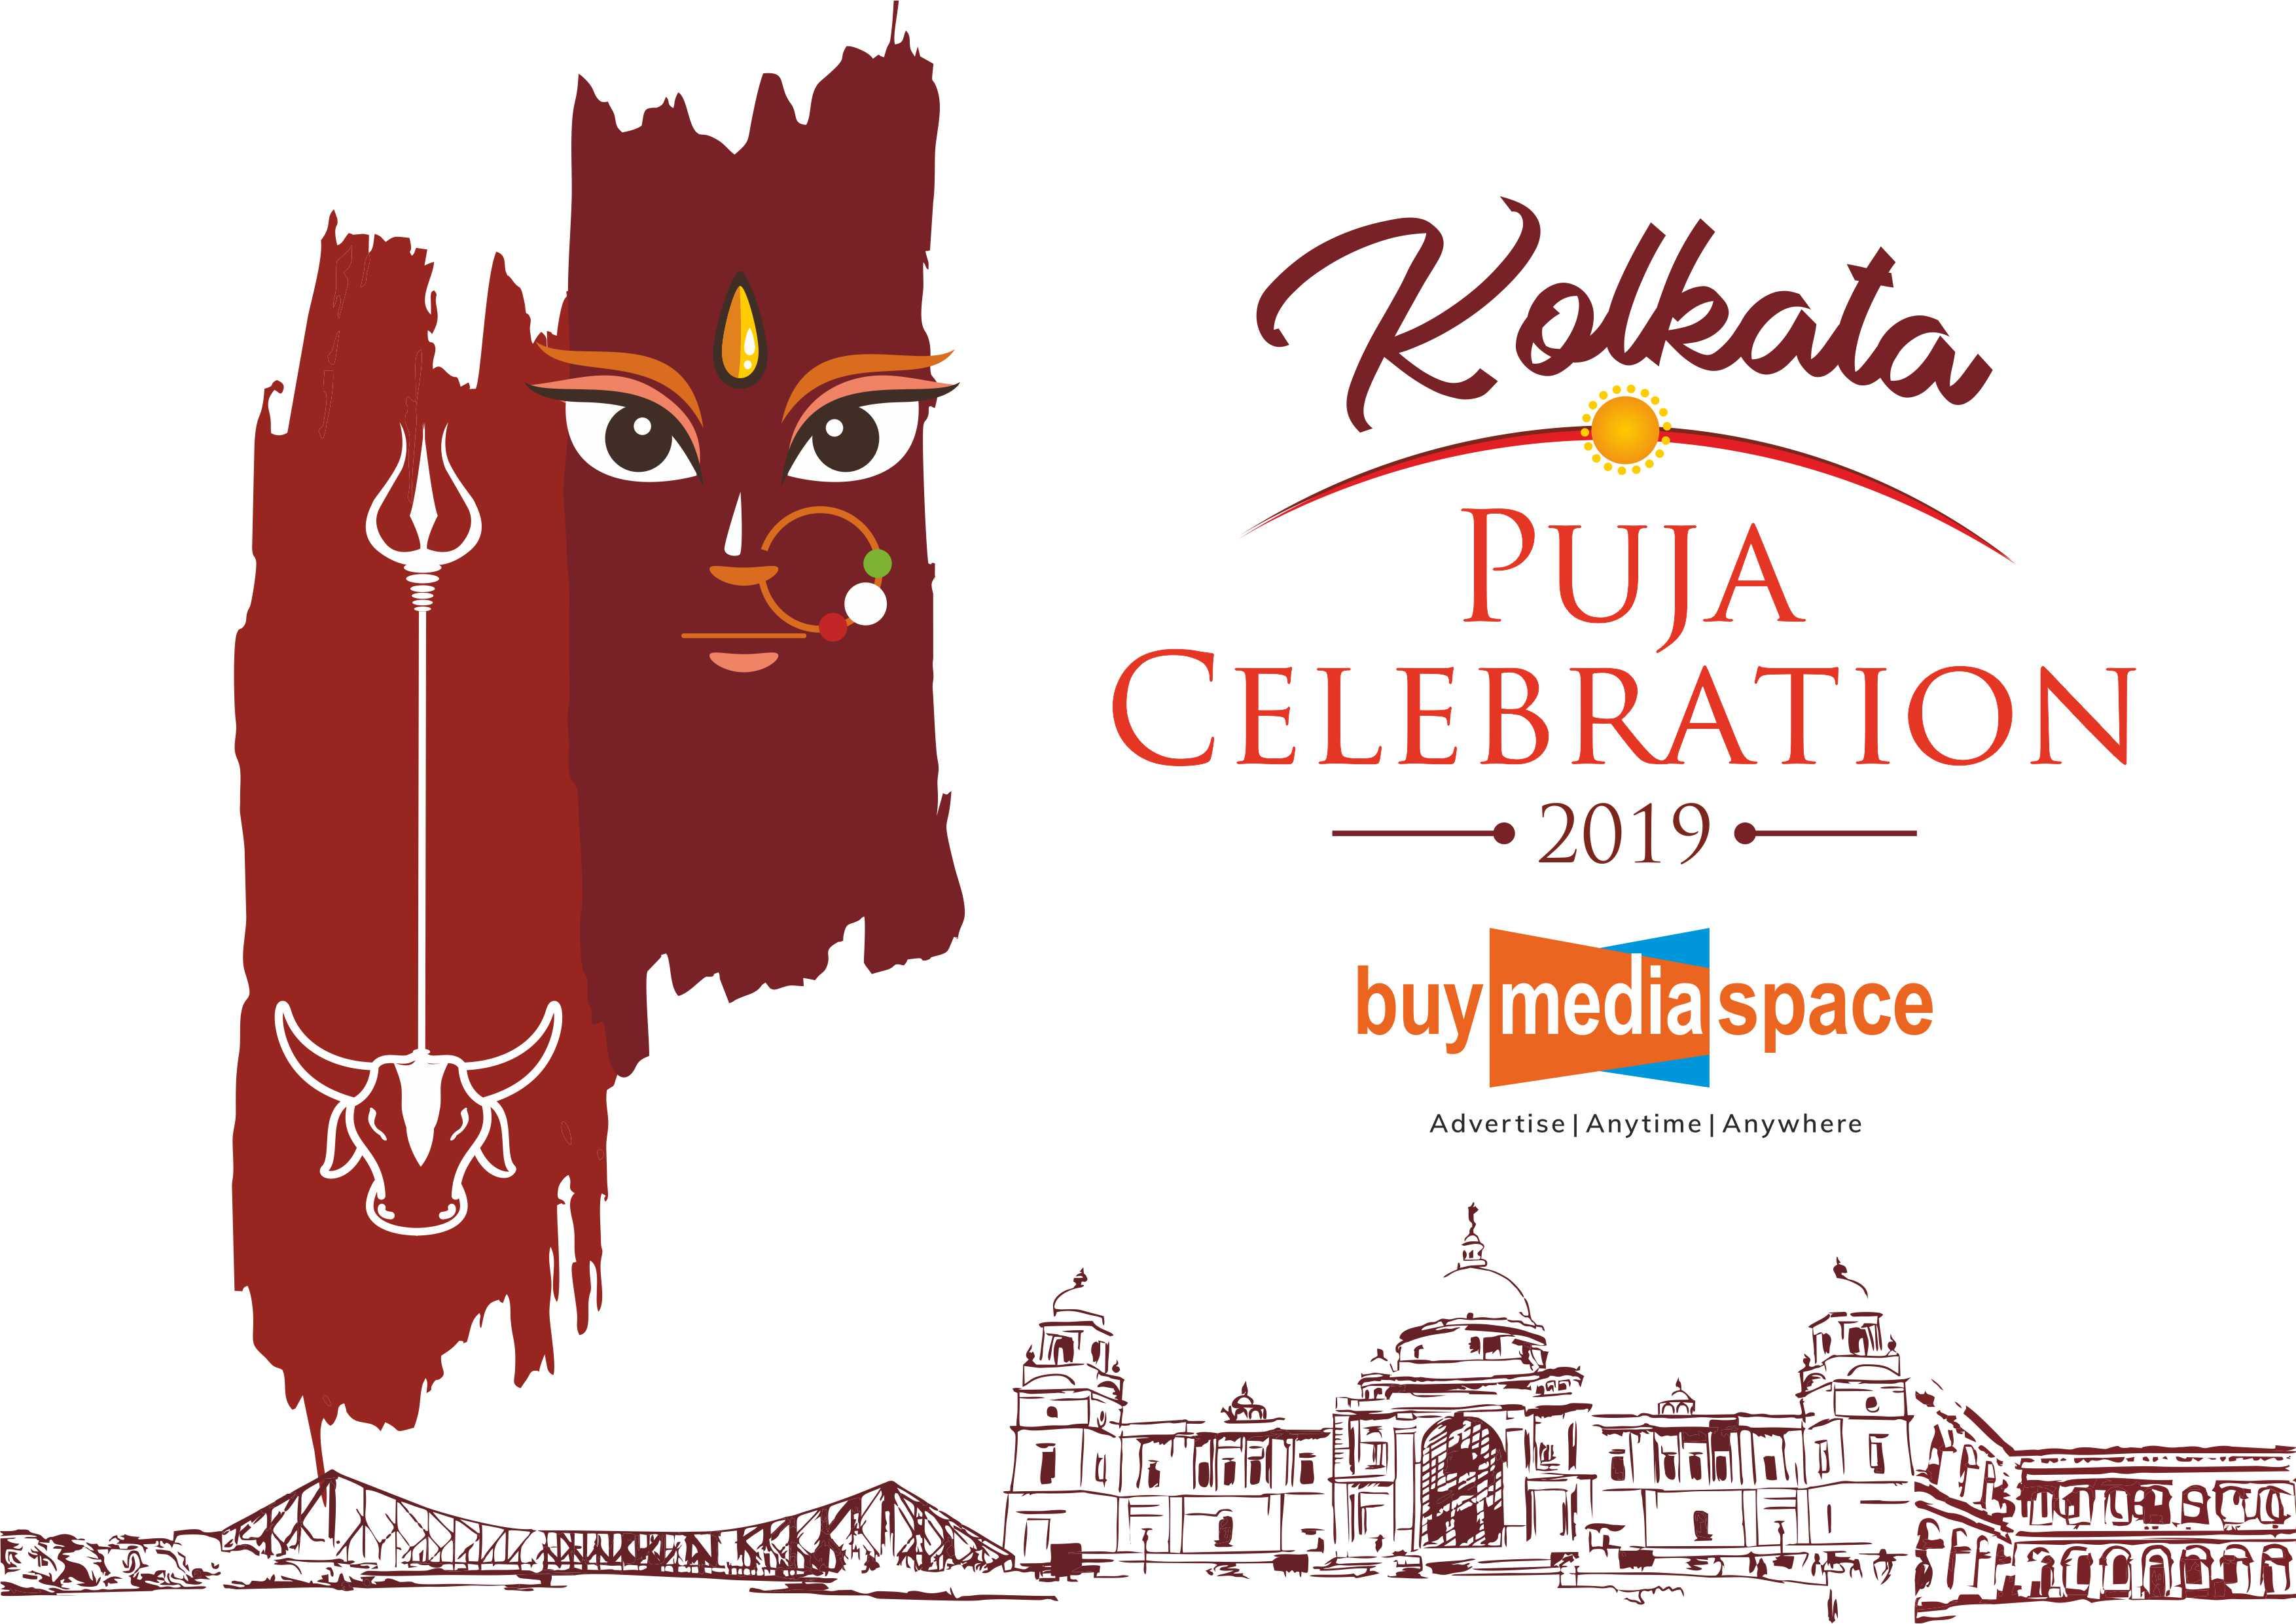 East Kolkata Puja Celebration